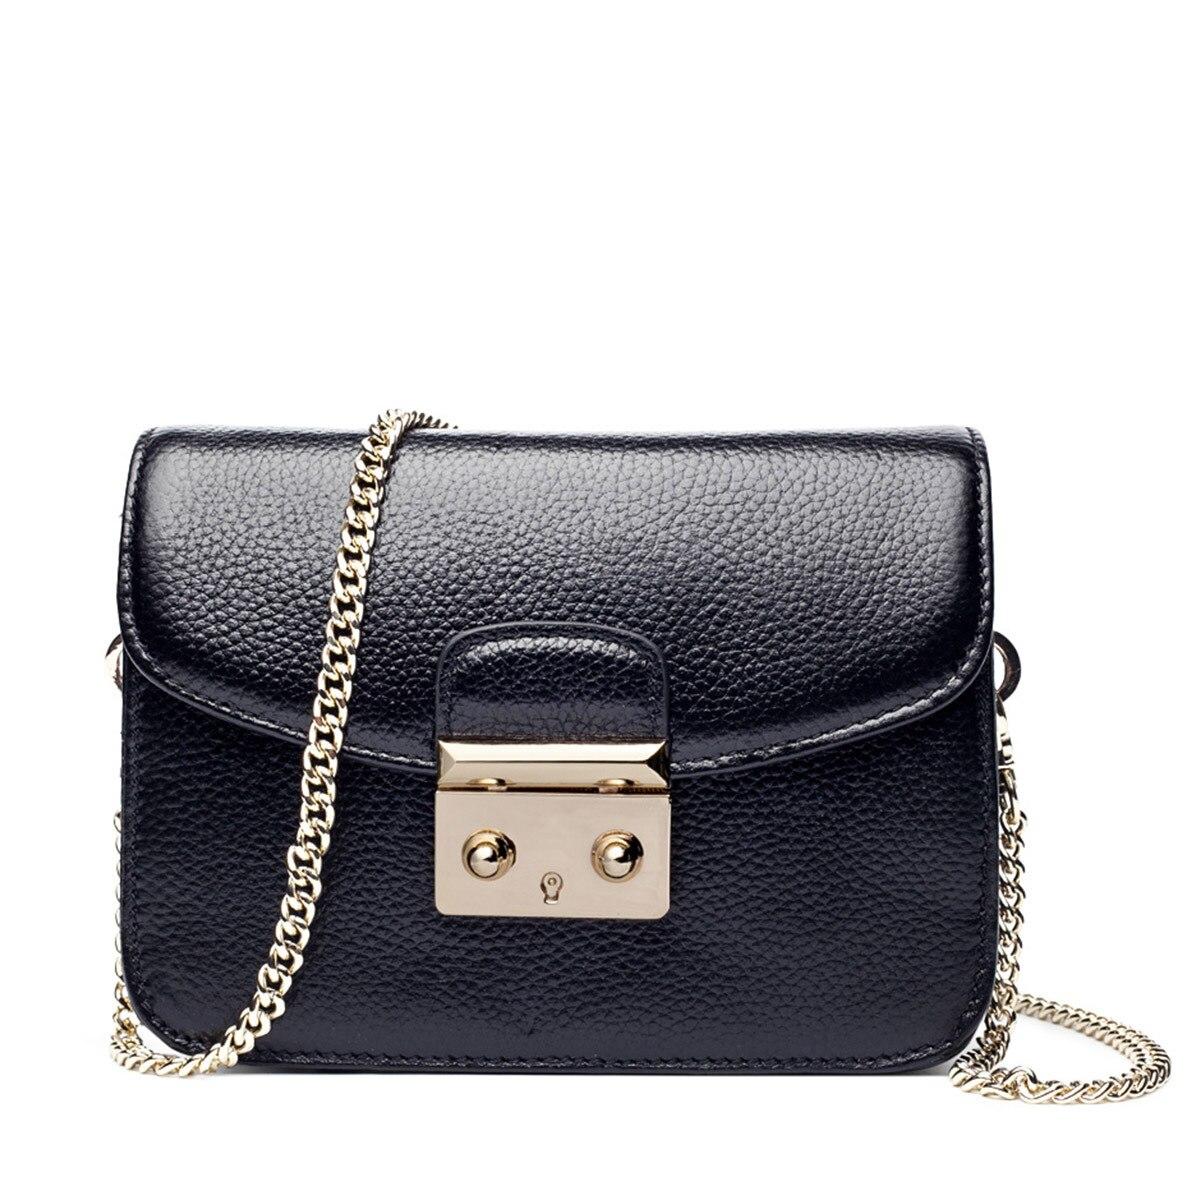 2017 New  Women Messenger bag genuine leather clutch bag Chain stitching Panelled Patchwork ladies Lip skull crossbody bag<br><br>Aliexpress